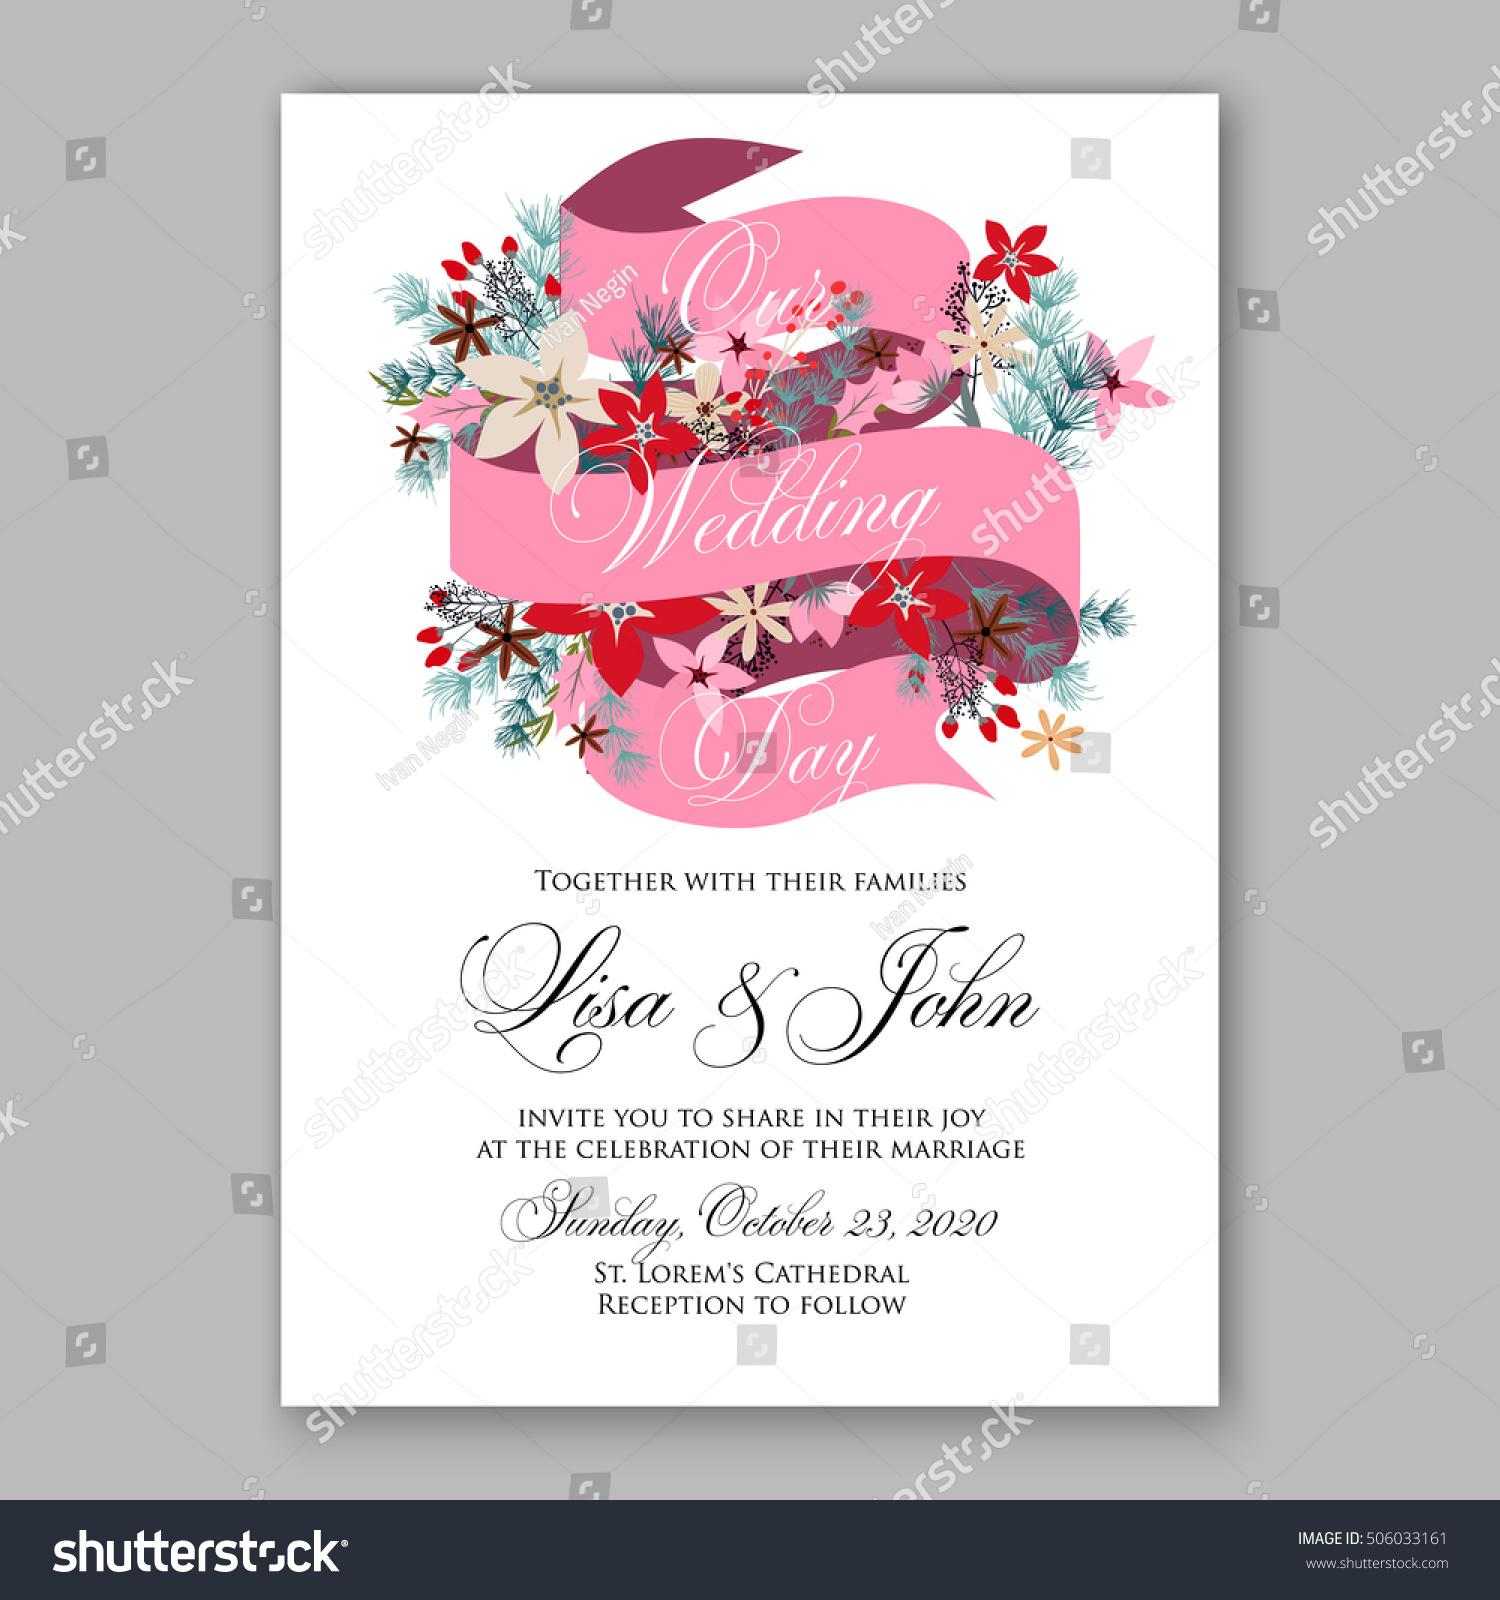 Poinsettia wedding invitation sample card beautiful stock vector poinsettia wedding invitation sample card beautiful stock vector 506033161 shutterstock stopboris Choice Image